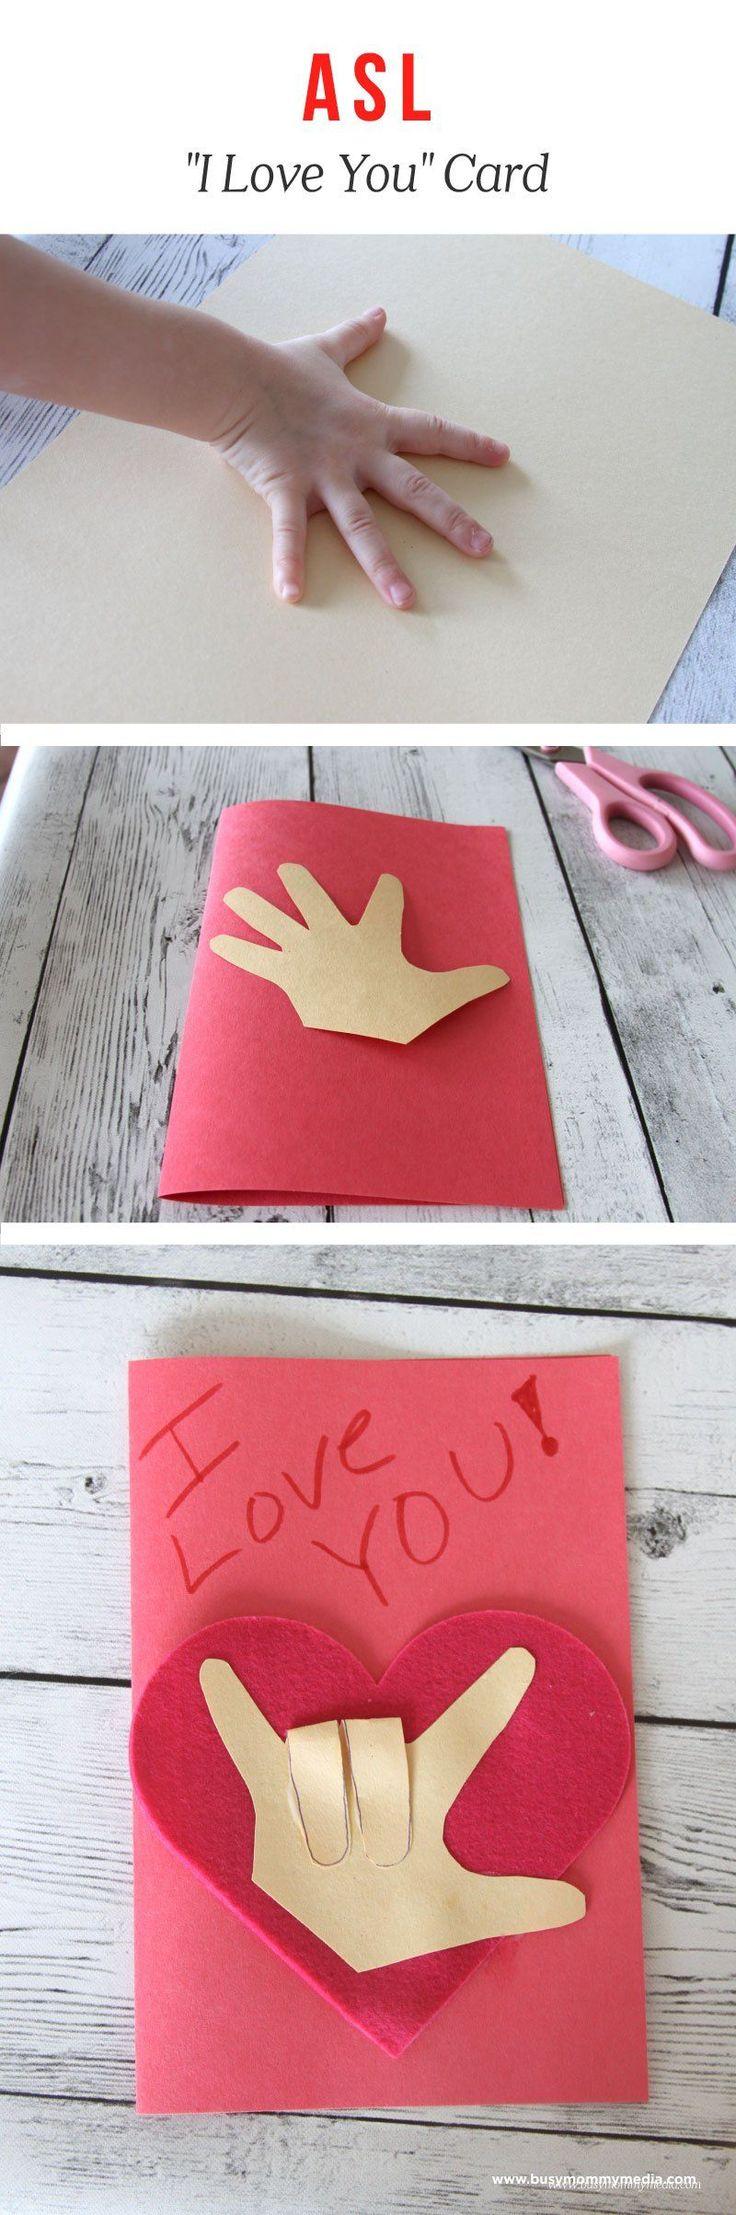 ASL I-Love-You Craft